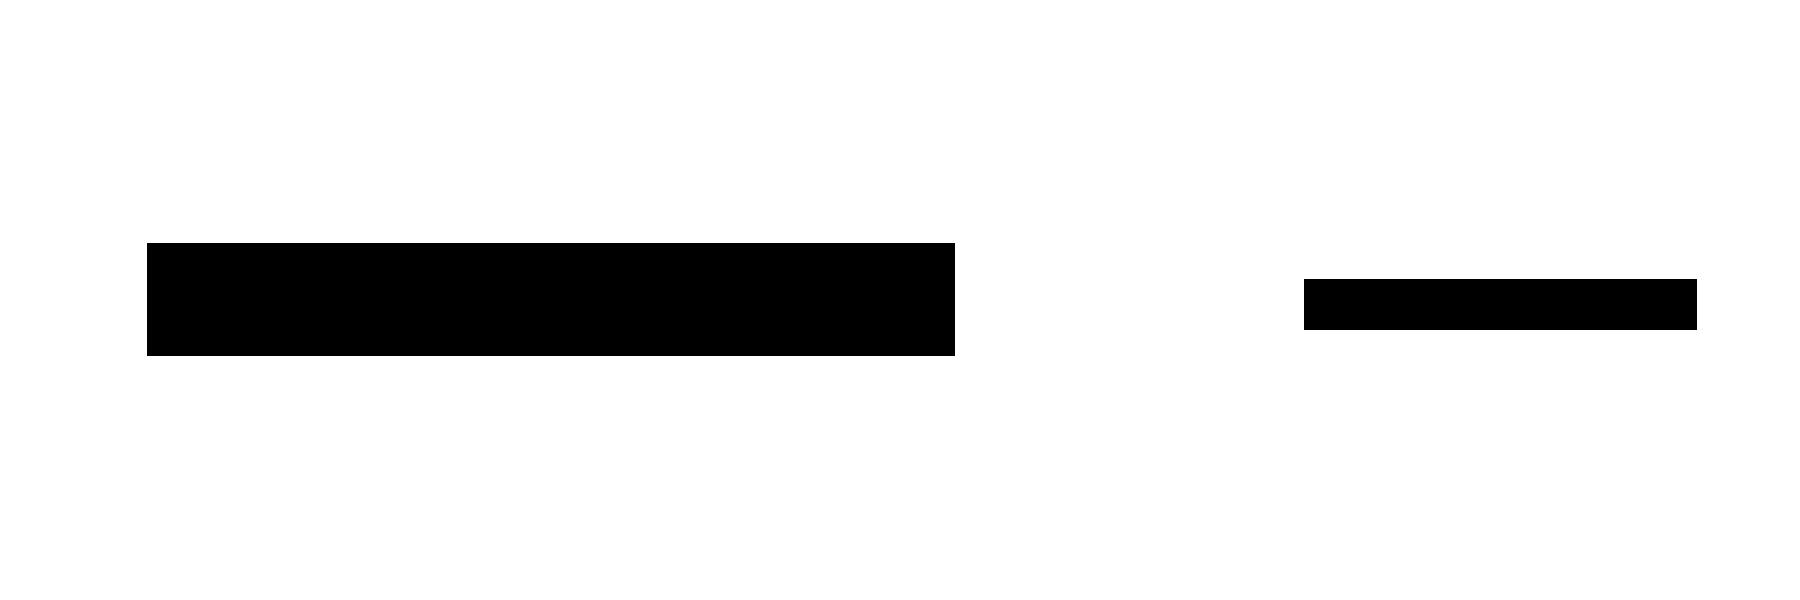 01_SunsetStudios_Logos_02B